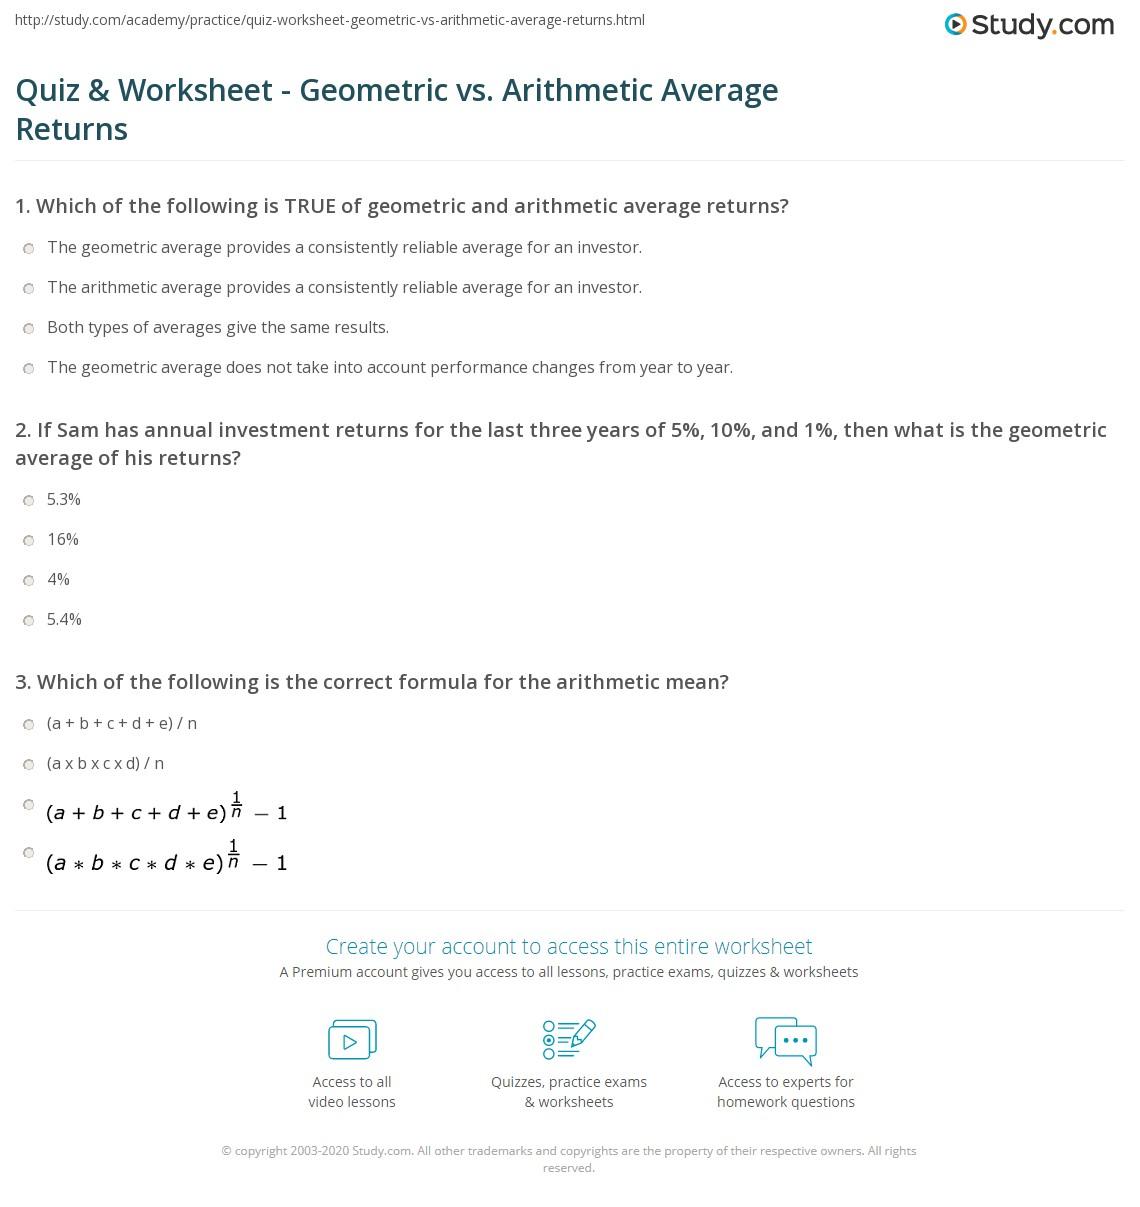 worksheet geometric mean worksheet quiz worksheet geometric vs arithmetic average returns print worksheet - Geometric Mean Worksheet